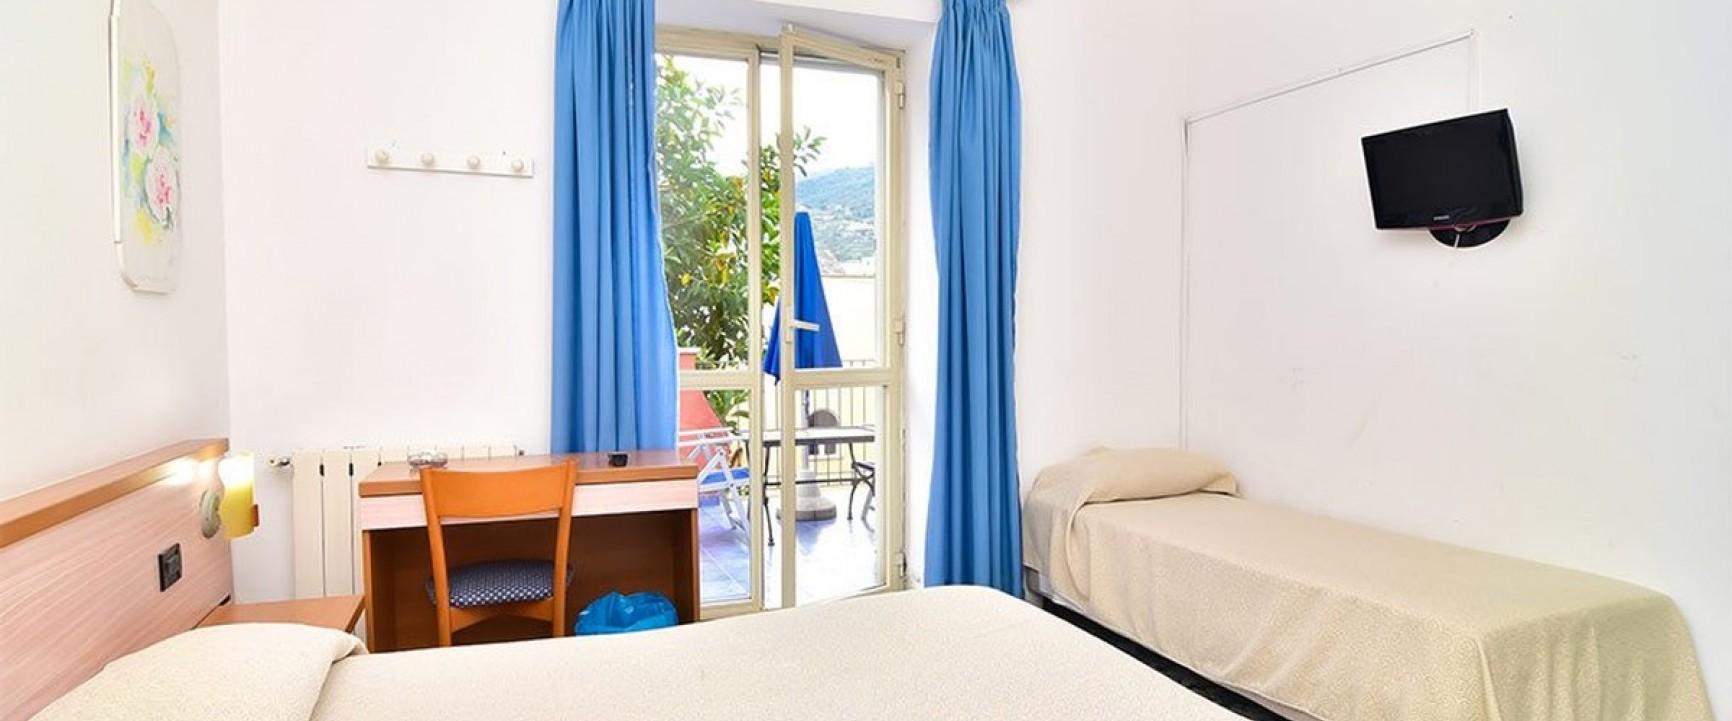 Hotel Terme Oriente